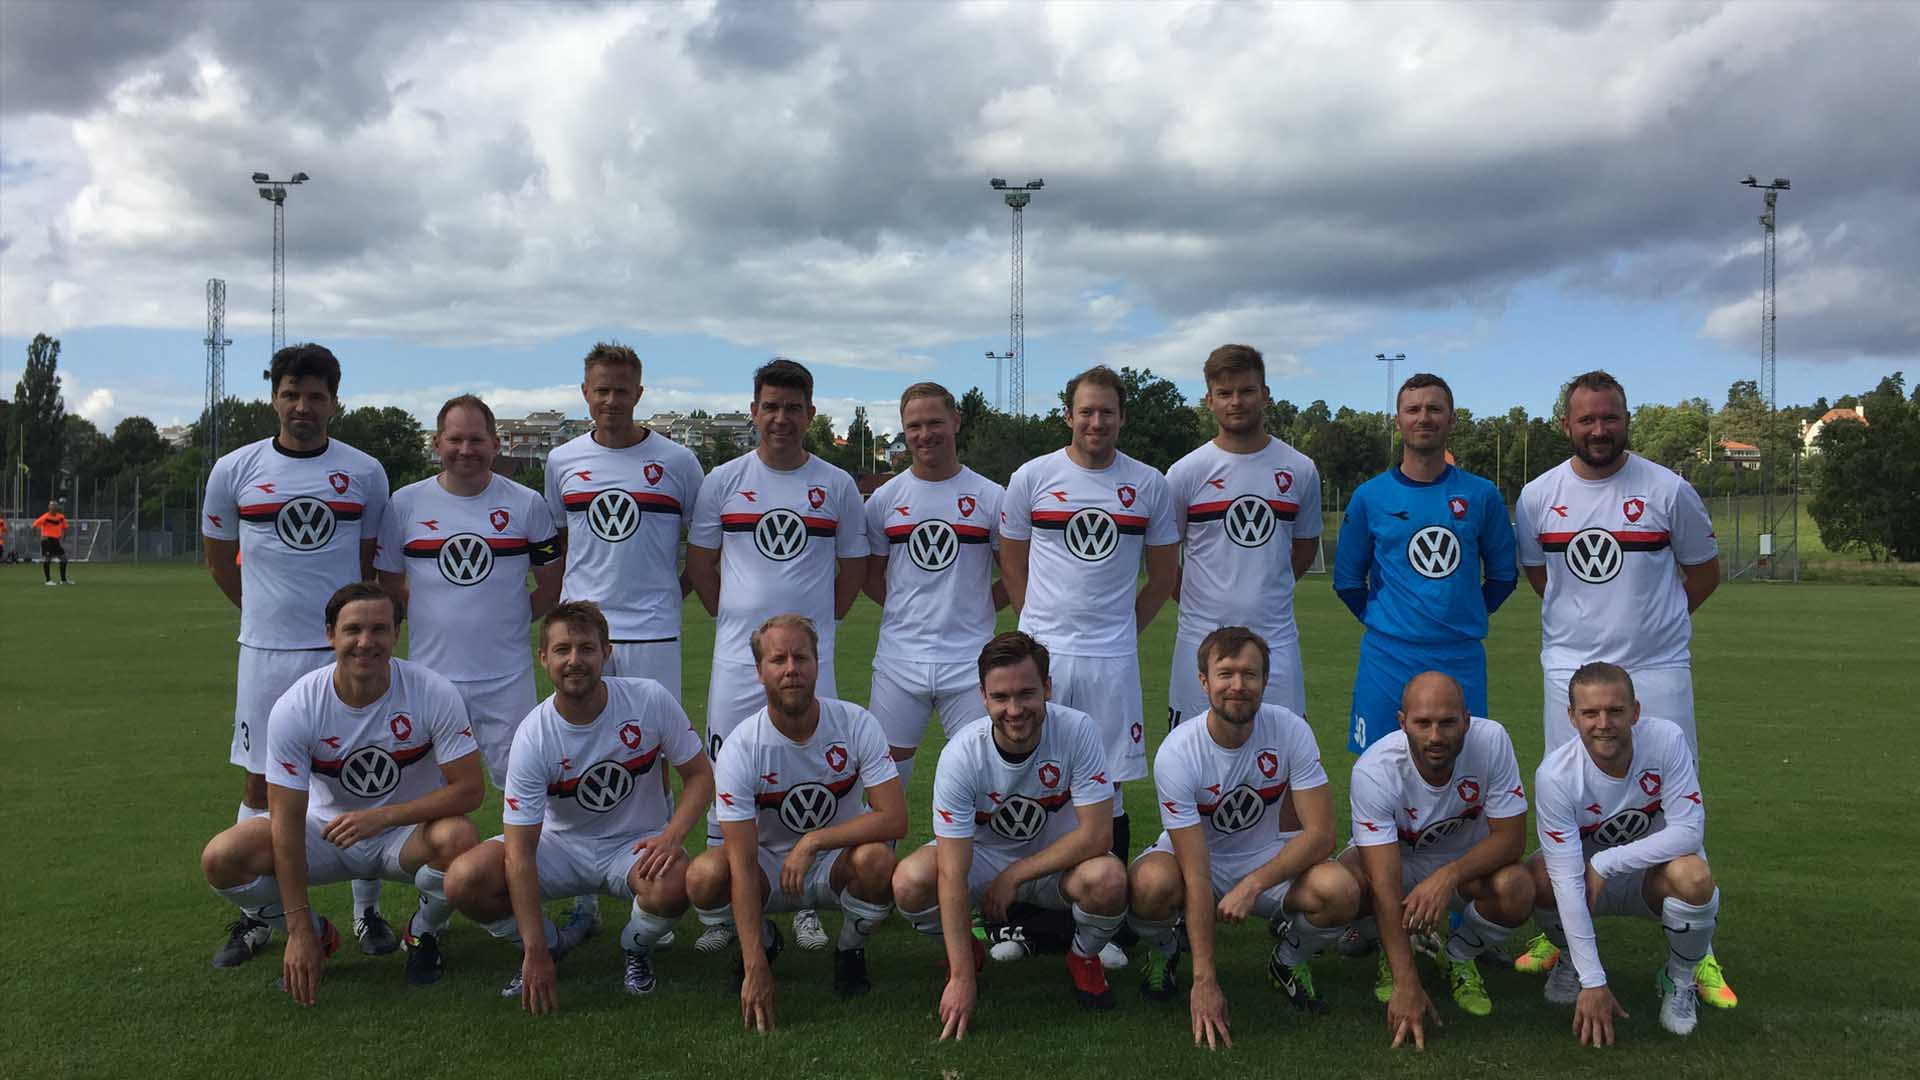 Matchrapport: Gazoliners – FC Sampierdarenese